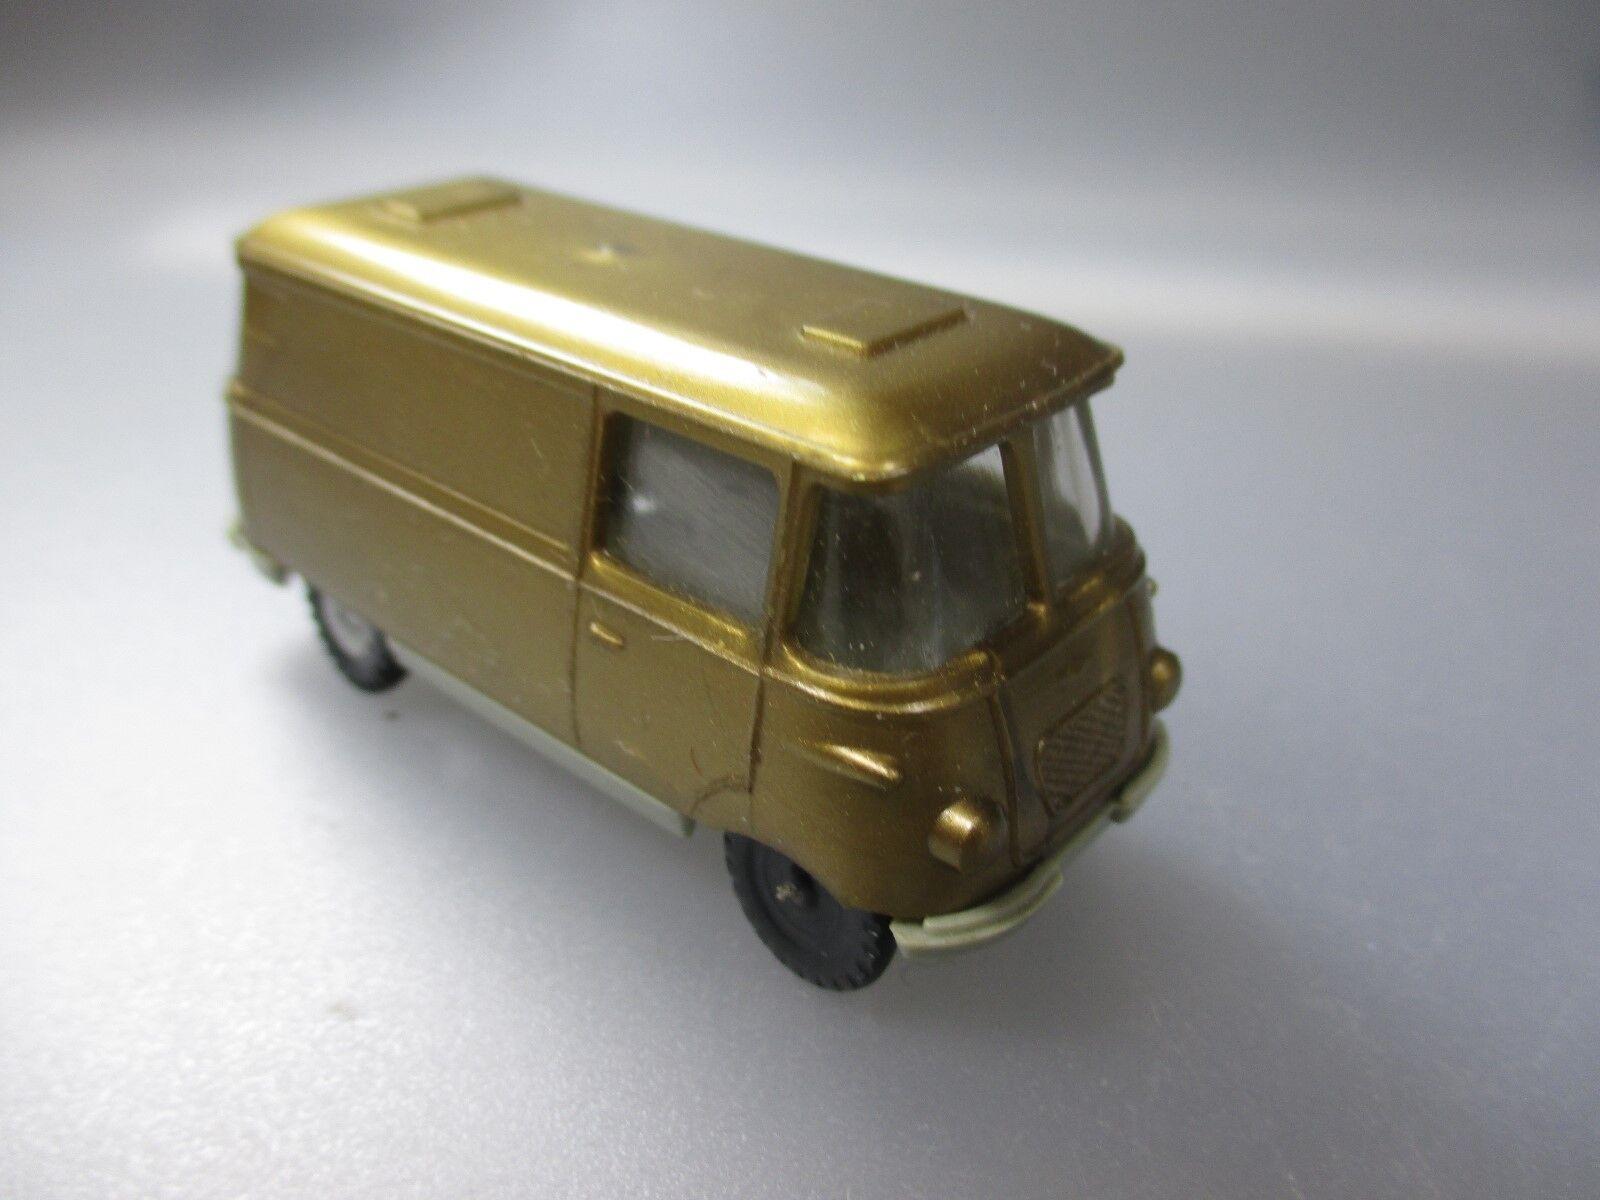 Ruch Estetyka Polen  Furconnysa  F501 Transporter, 1 72 72 72 Scale, Vintage  (GK109) 34b5f2